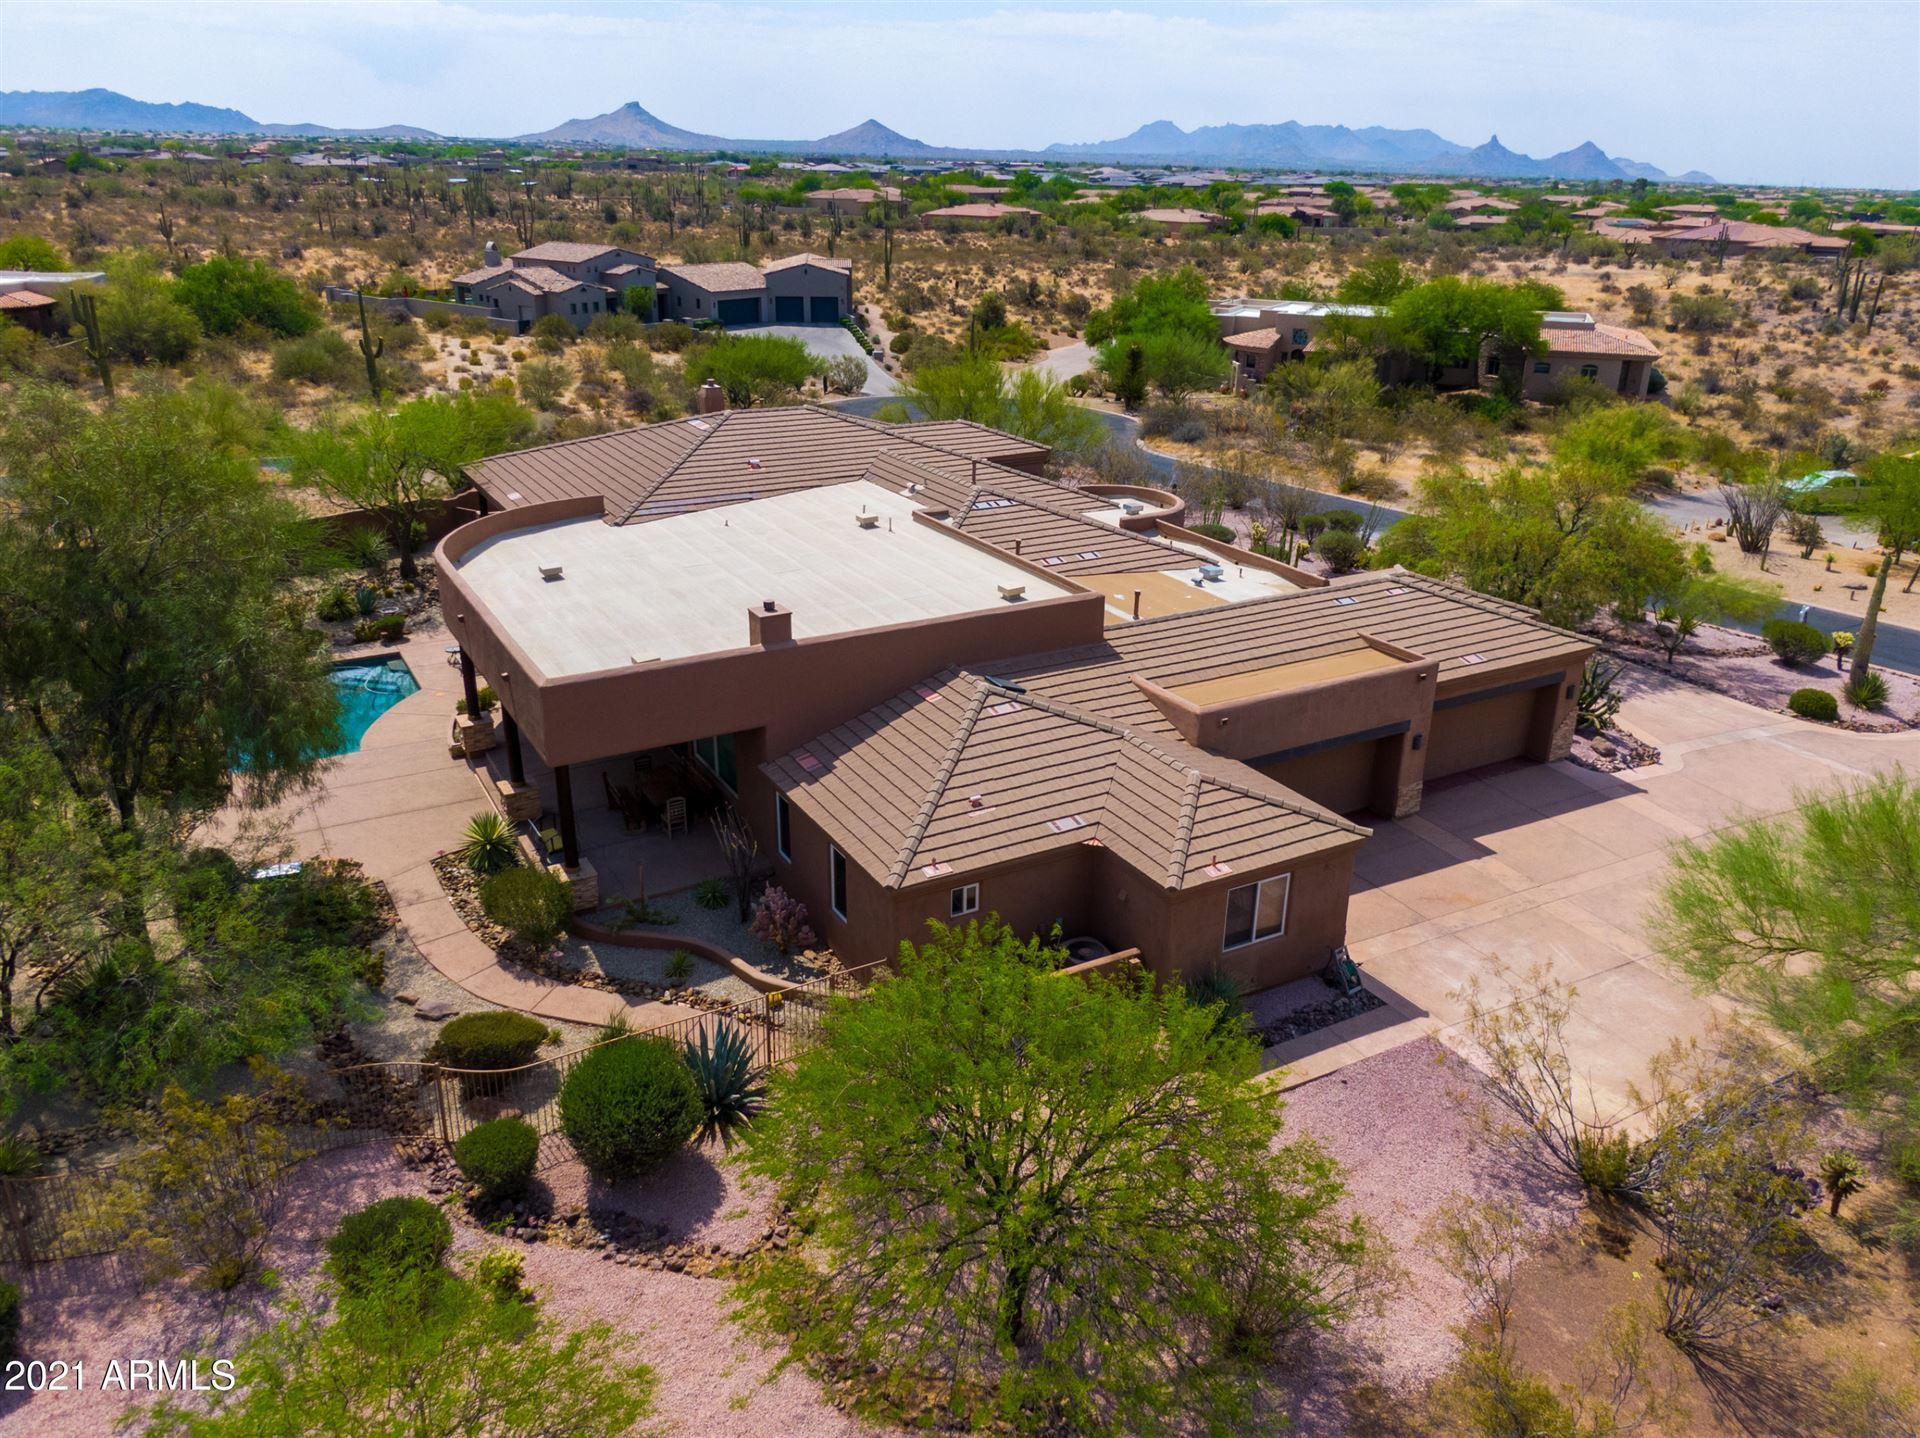 Photo of 8202 E TECOLOTE Circle, Scottsdale, AZ 85266 (MLS # 6255474)